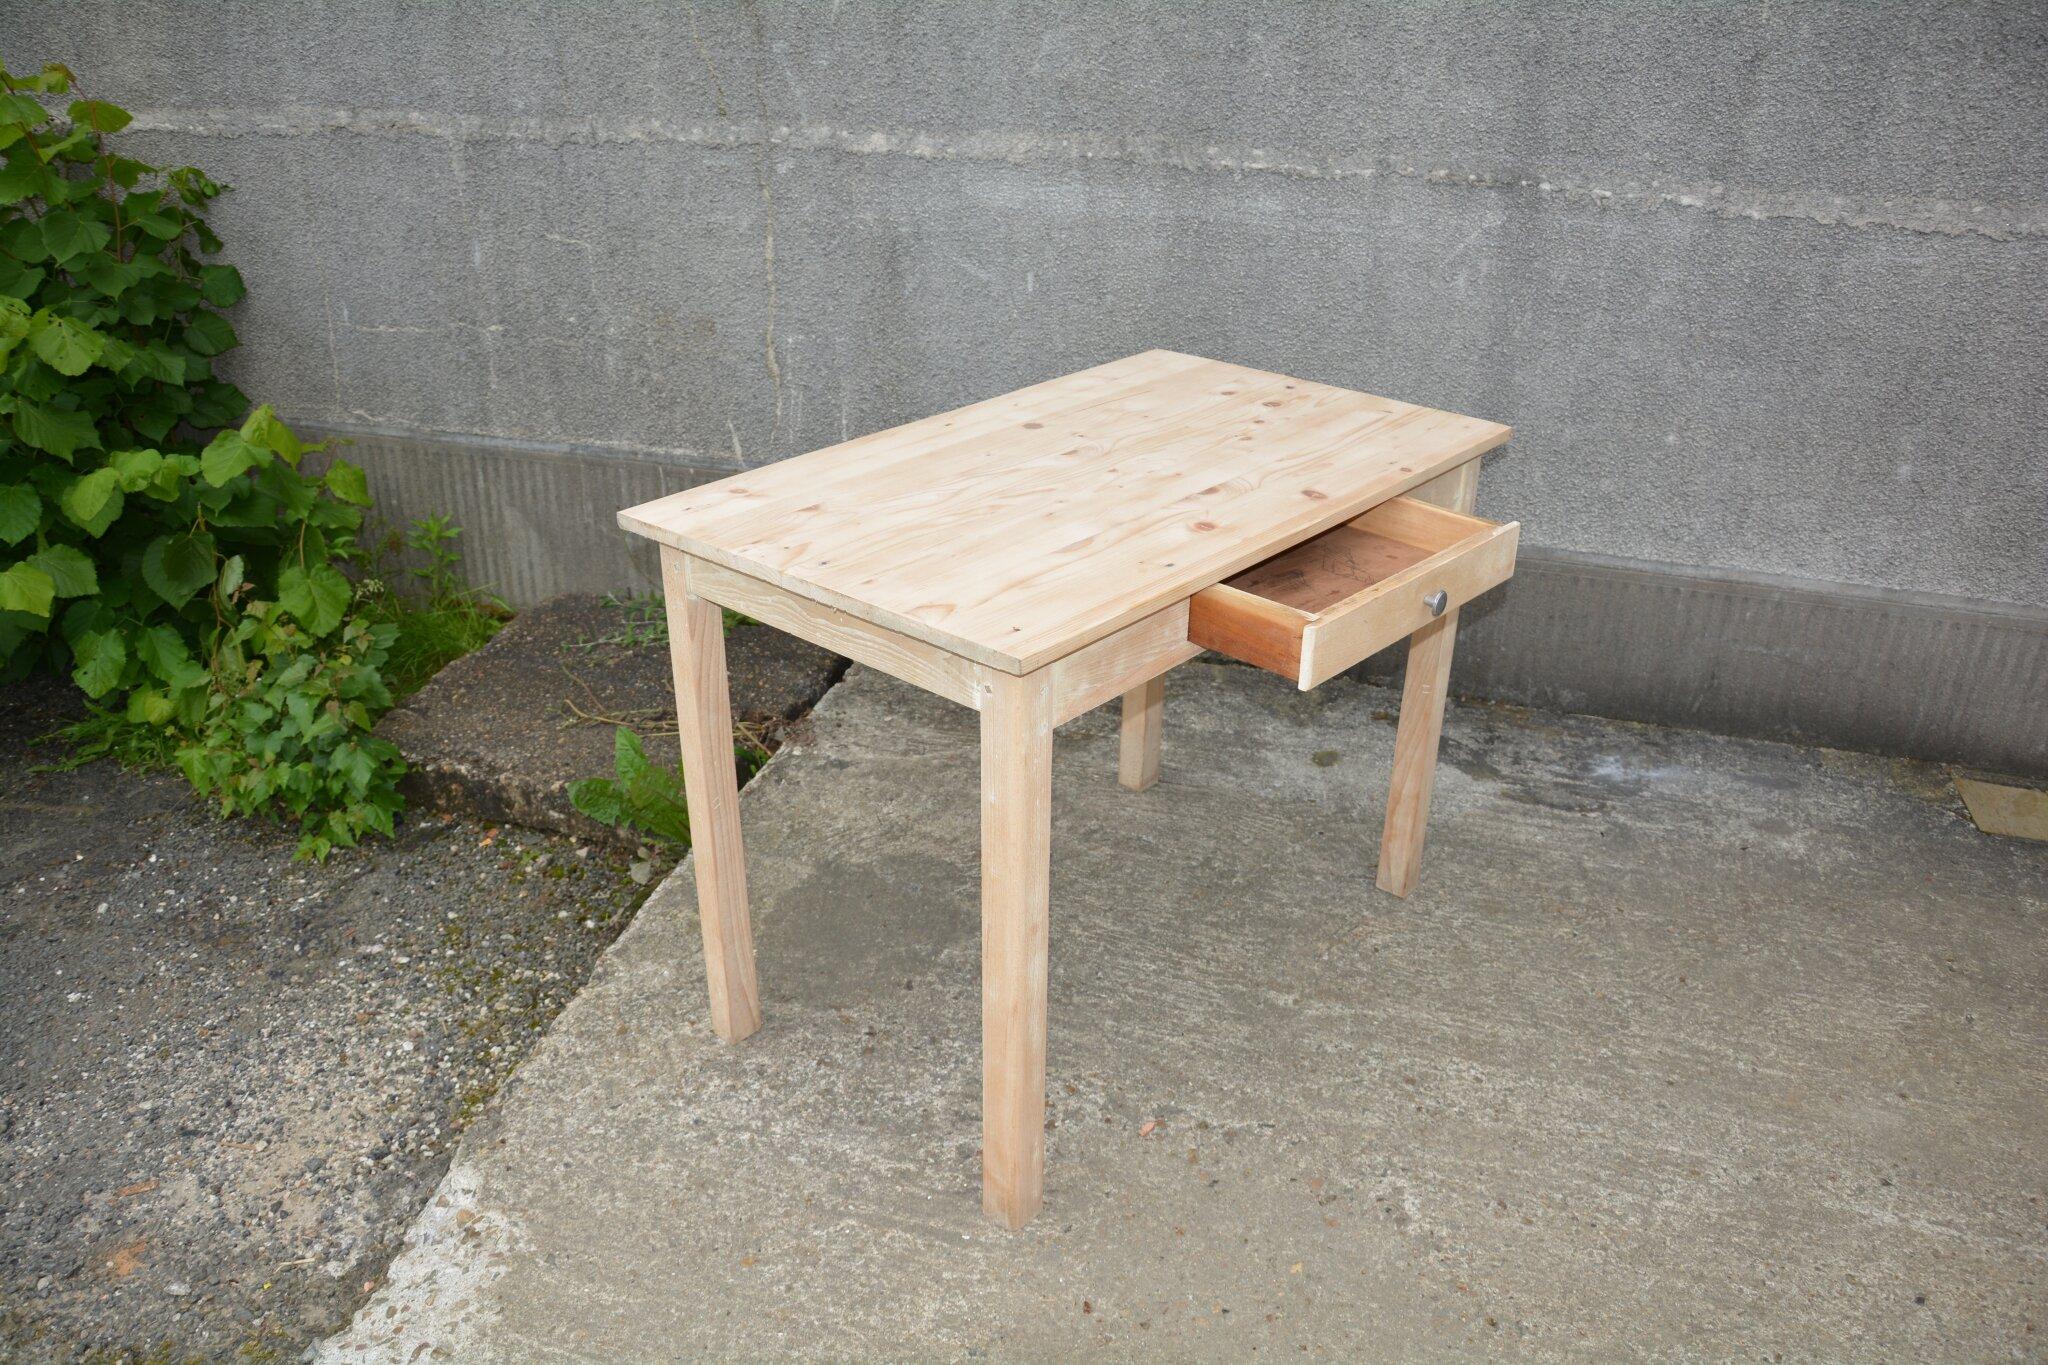 table de ferme bureau console poign e en aluminium la petite brocanteuse. Black Bedroom Furniture Sets. Home Design Ideas